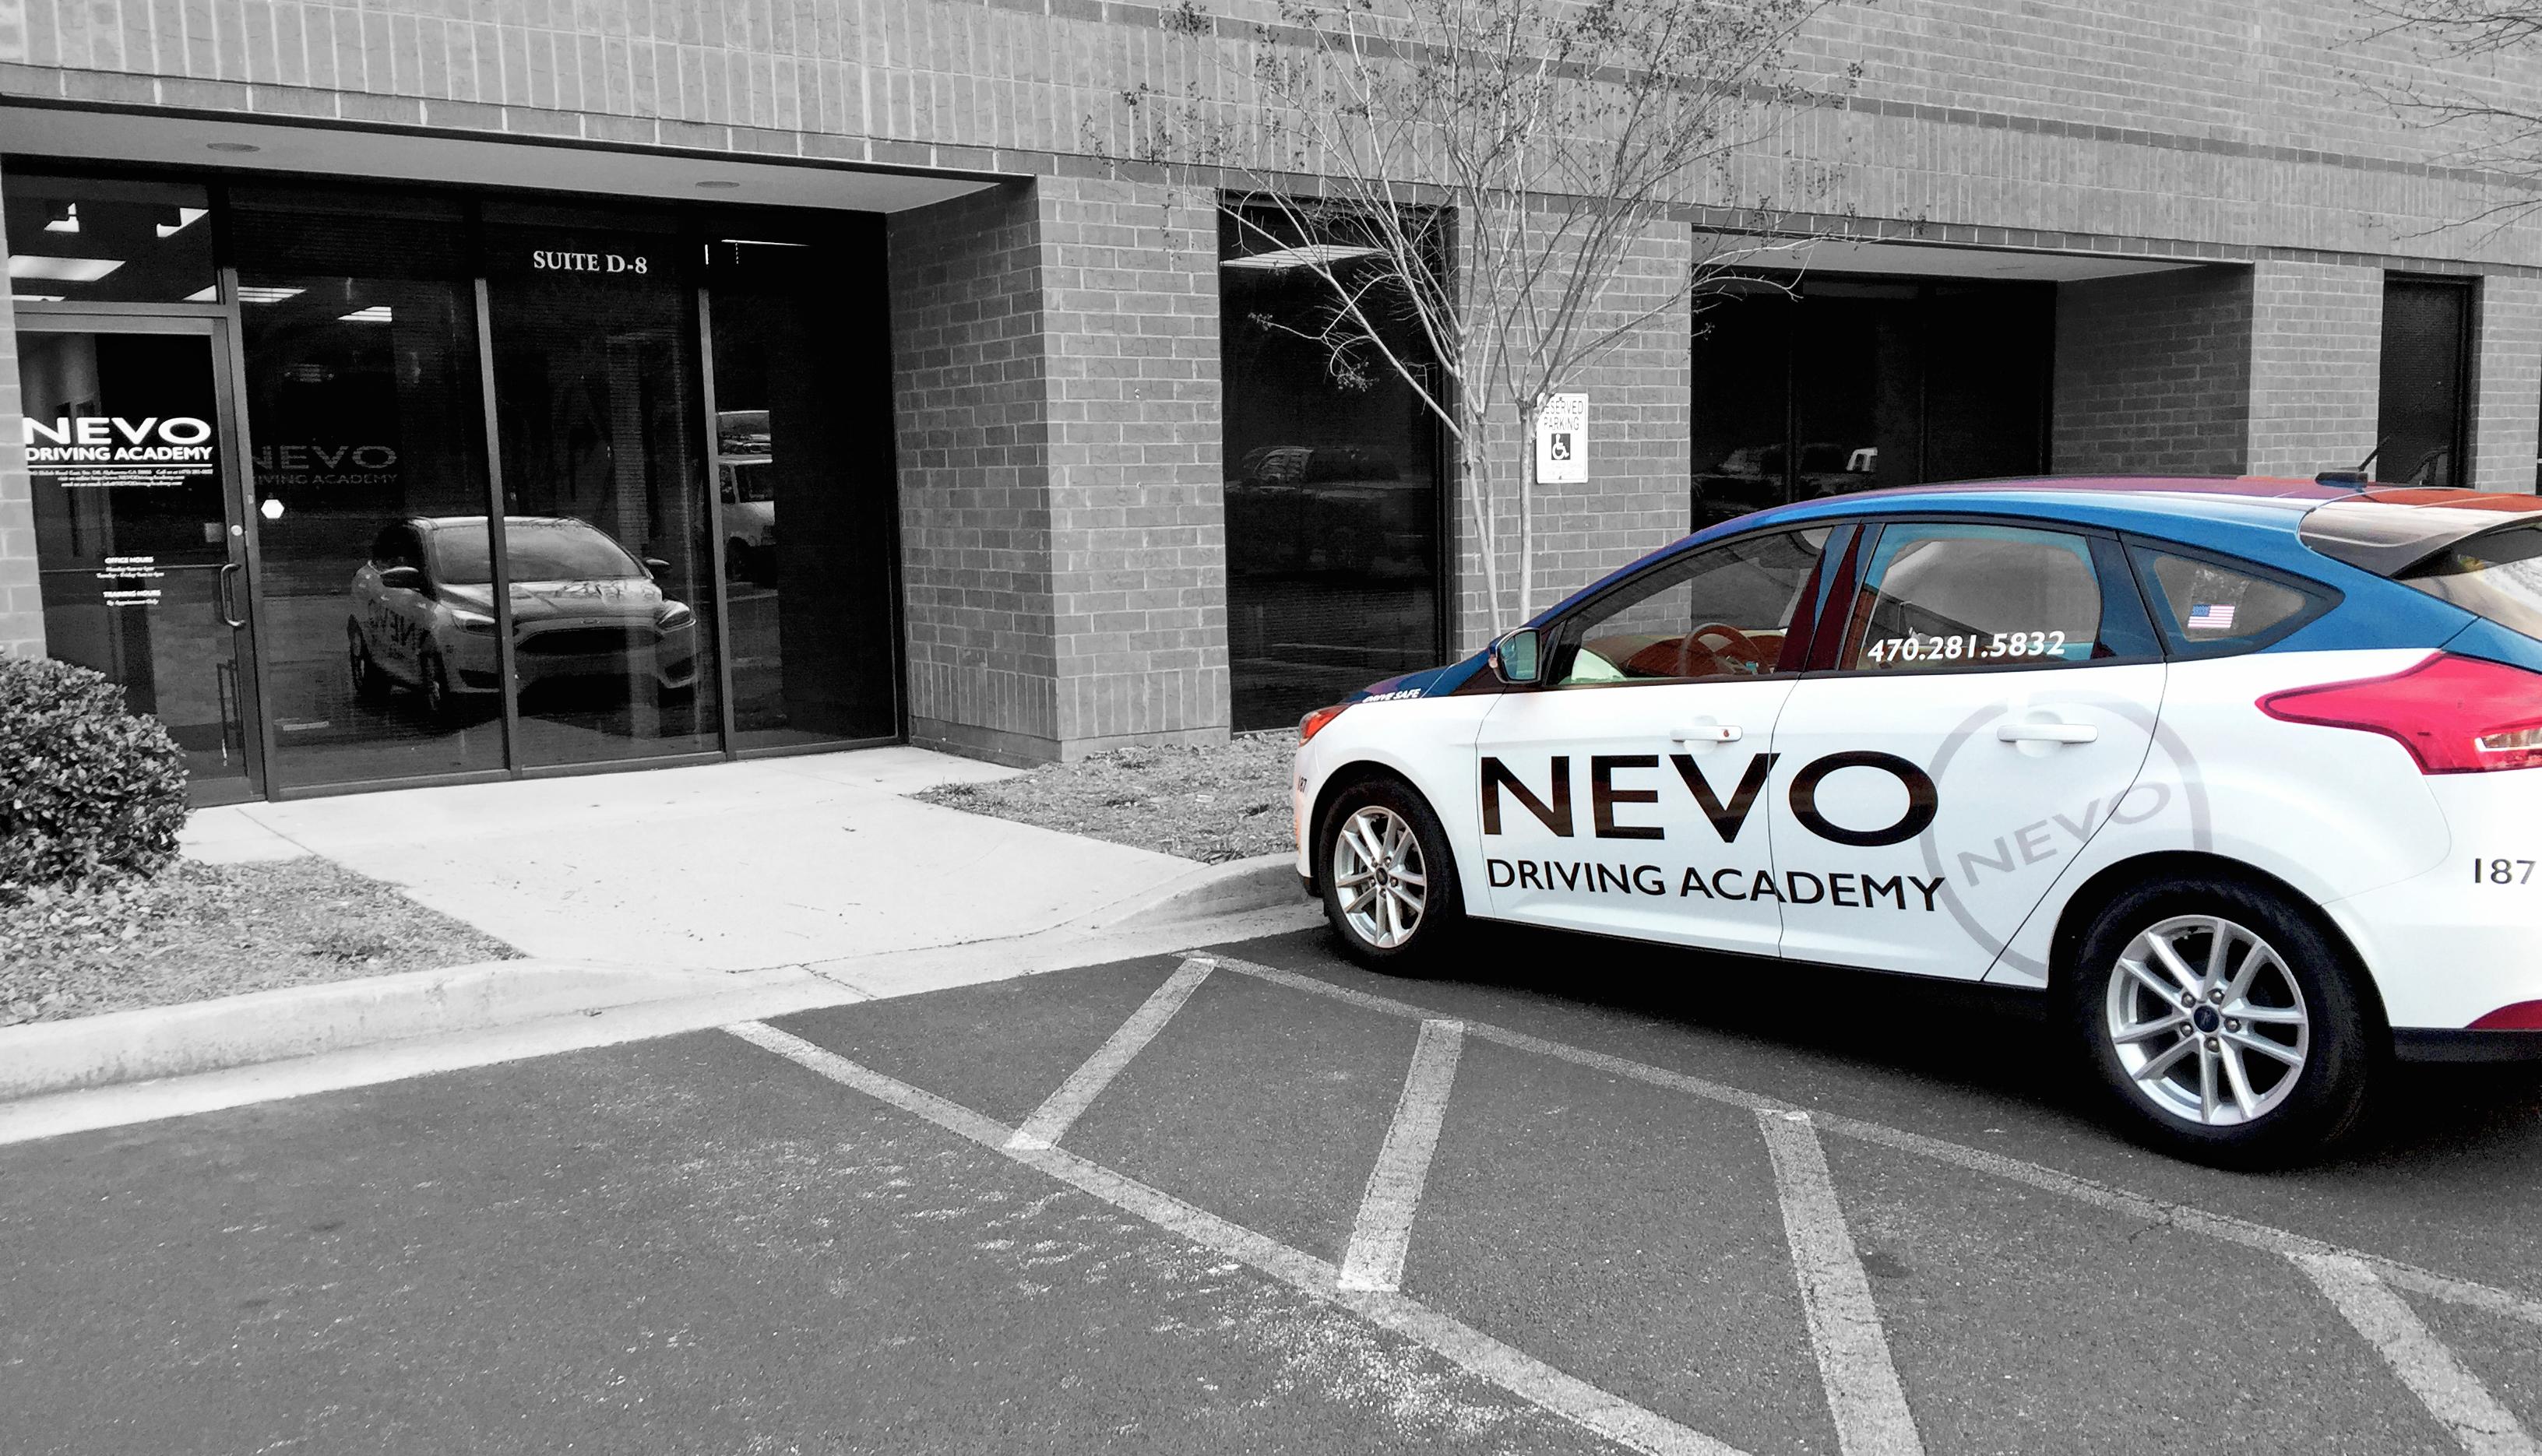 NEVO Driving Academy image 1